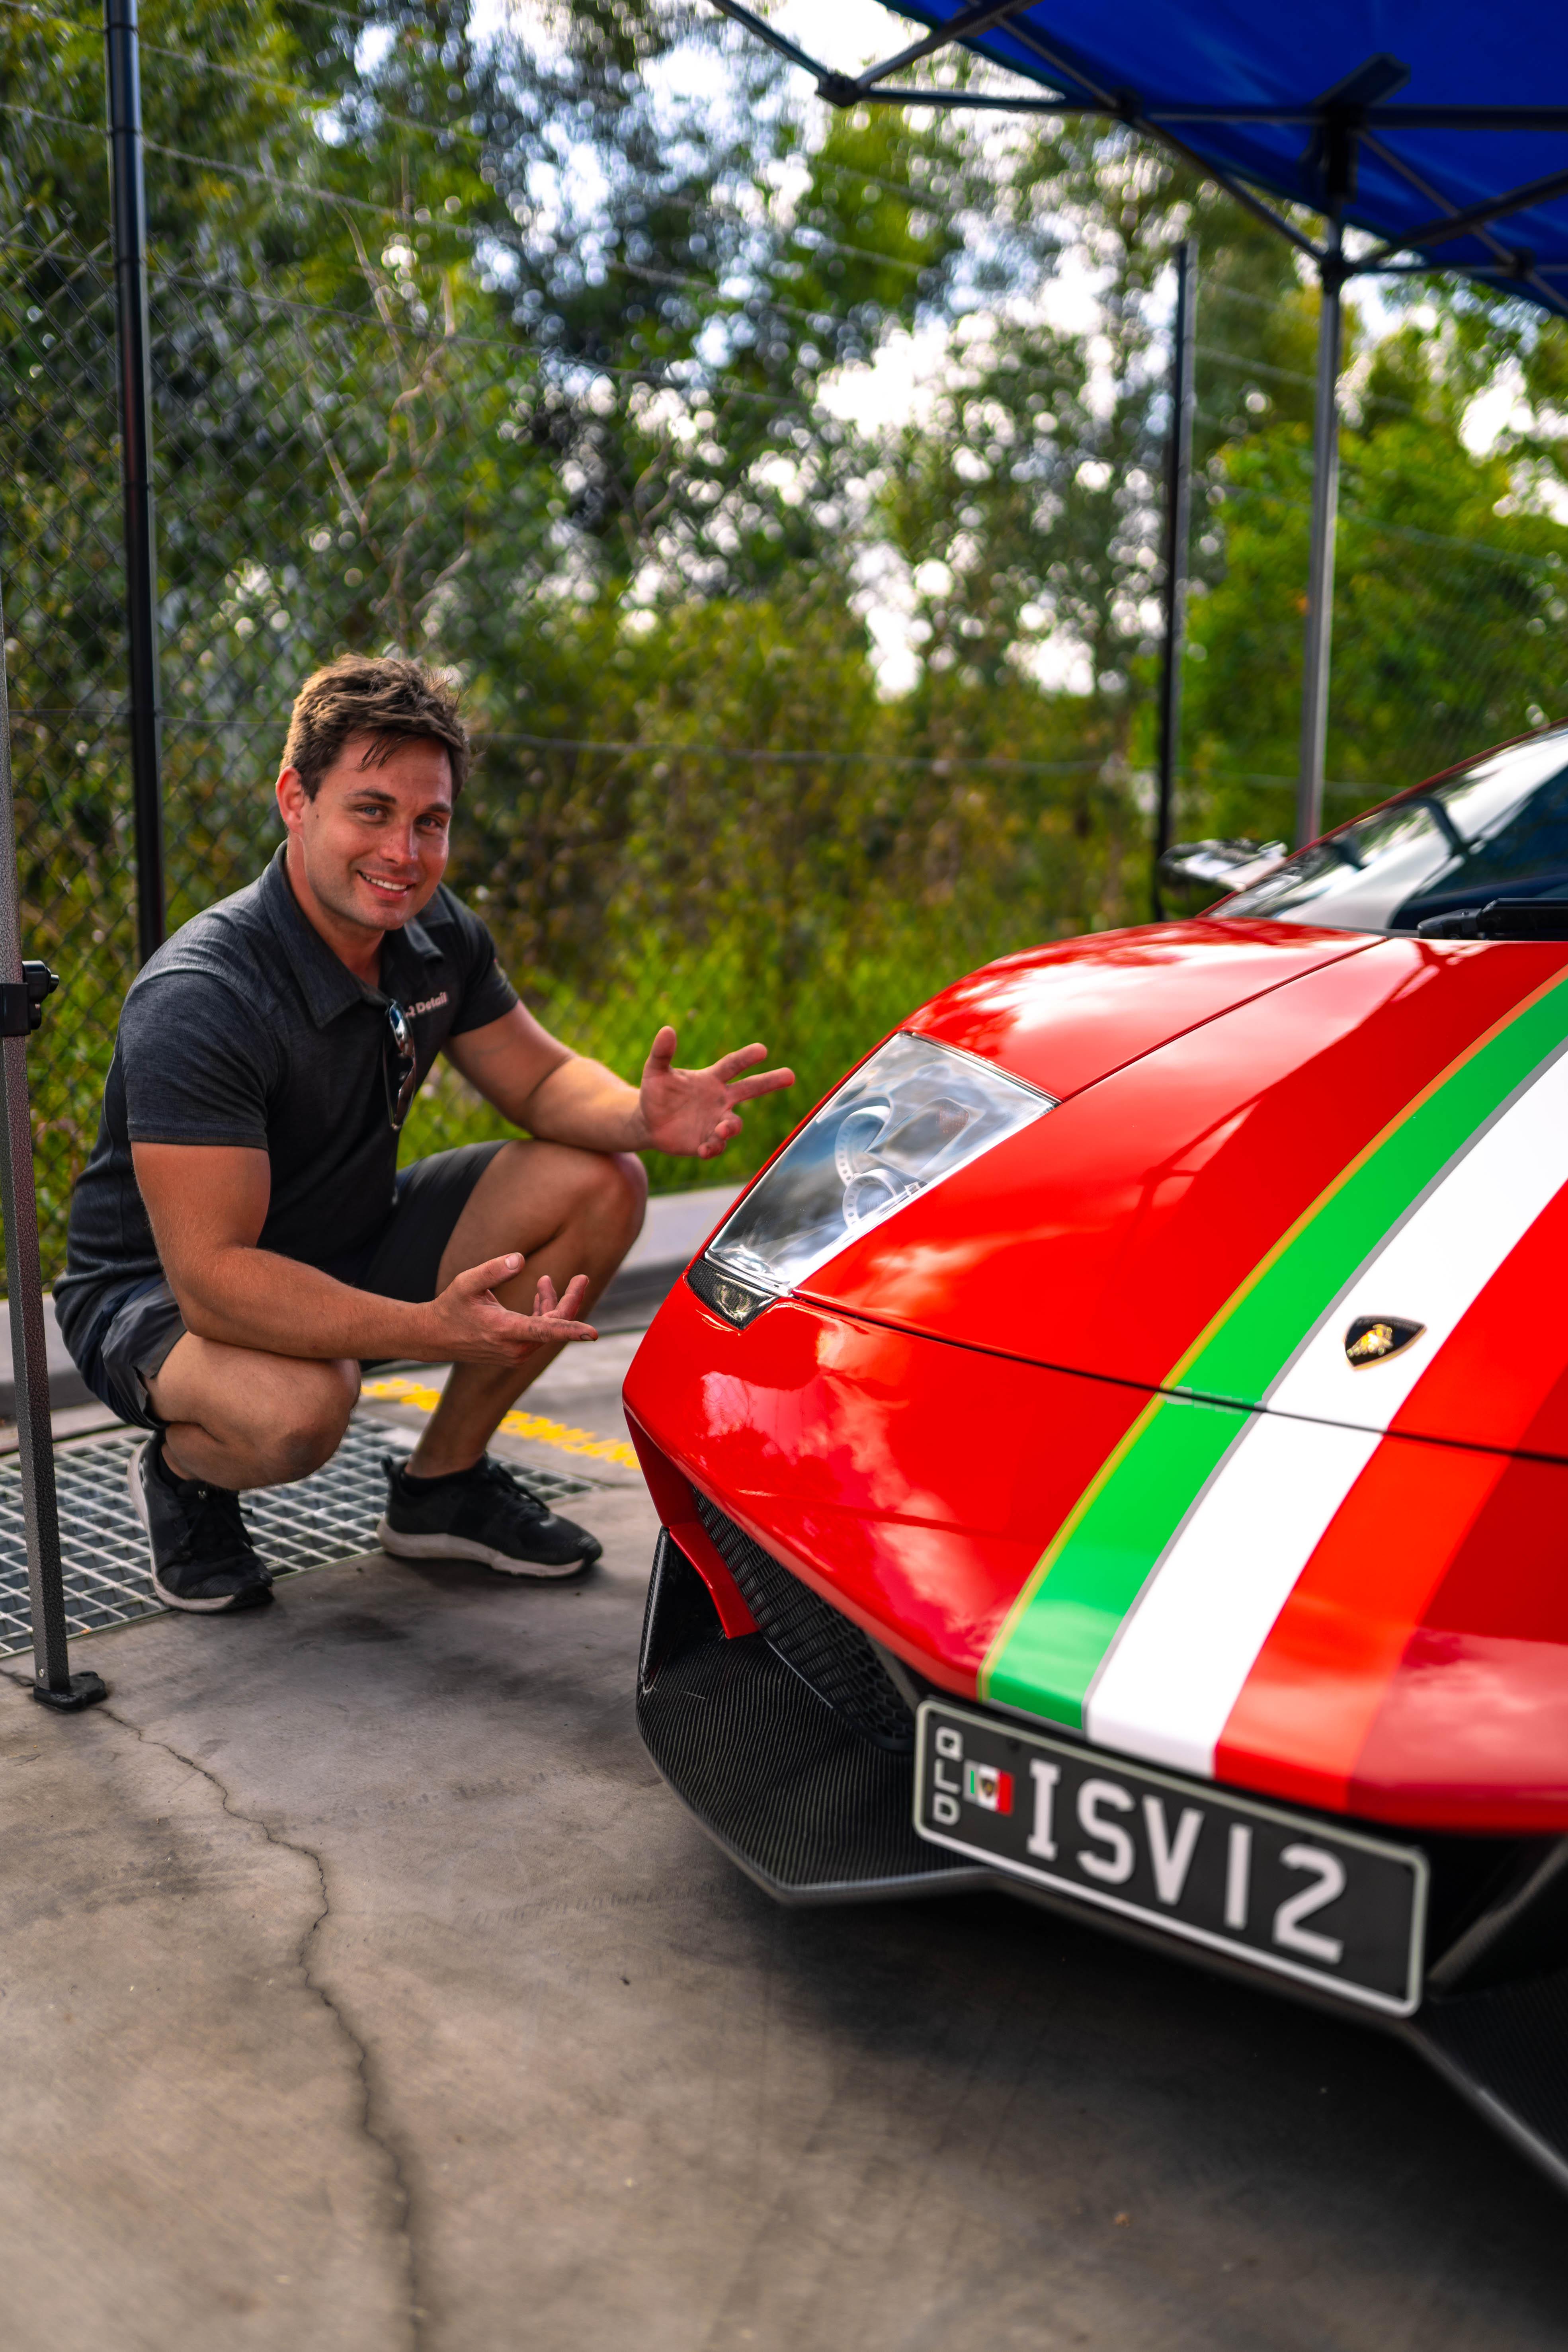 Image of David Vertesi infront of a vehicle he has been detailing